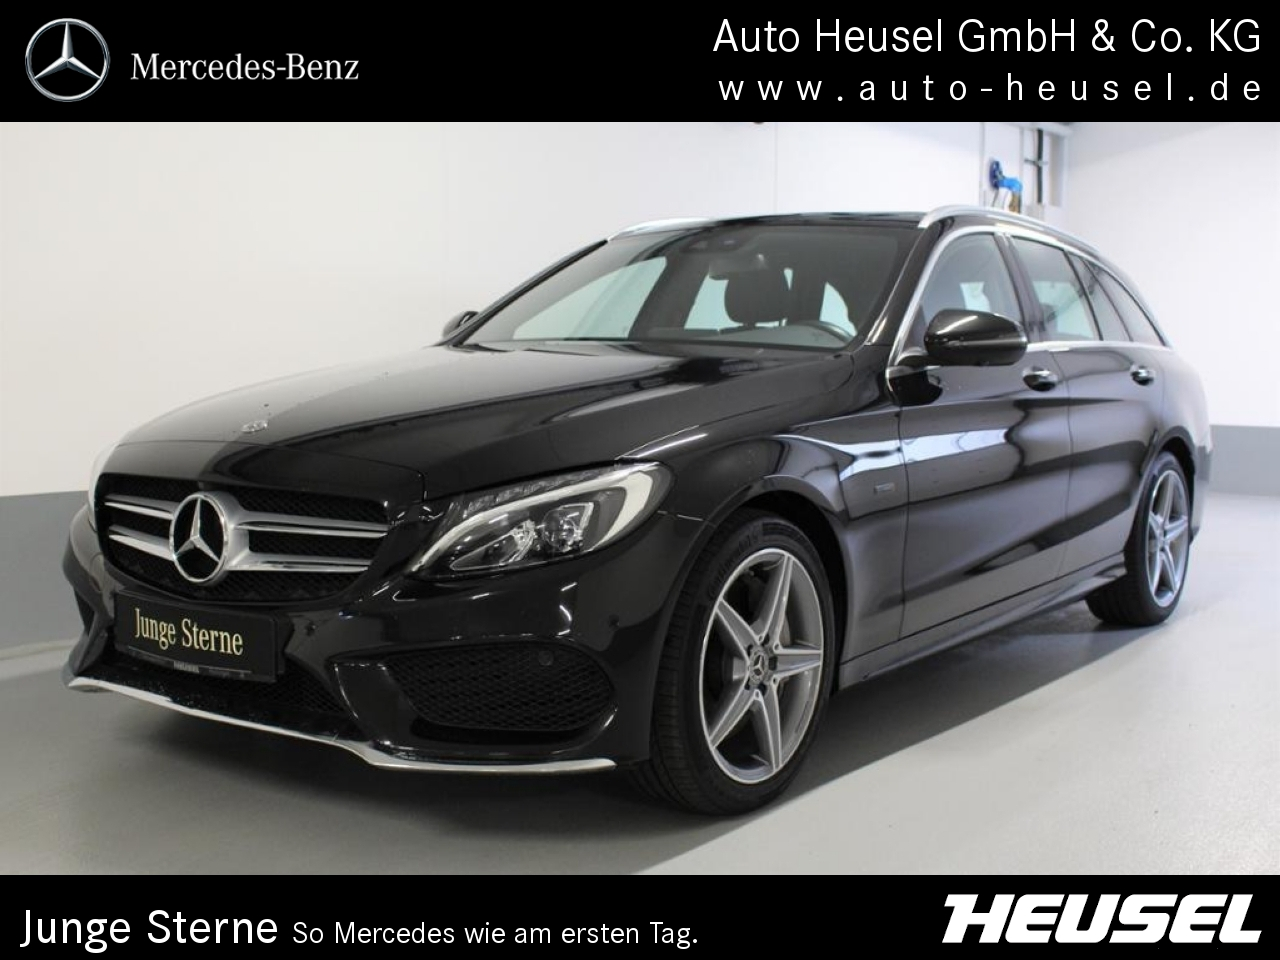 Mercedes-Benz C 350 e T AMG *PSHD*Comand*360°*Ambientebel.*, Jahr 2018, Hybrid